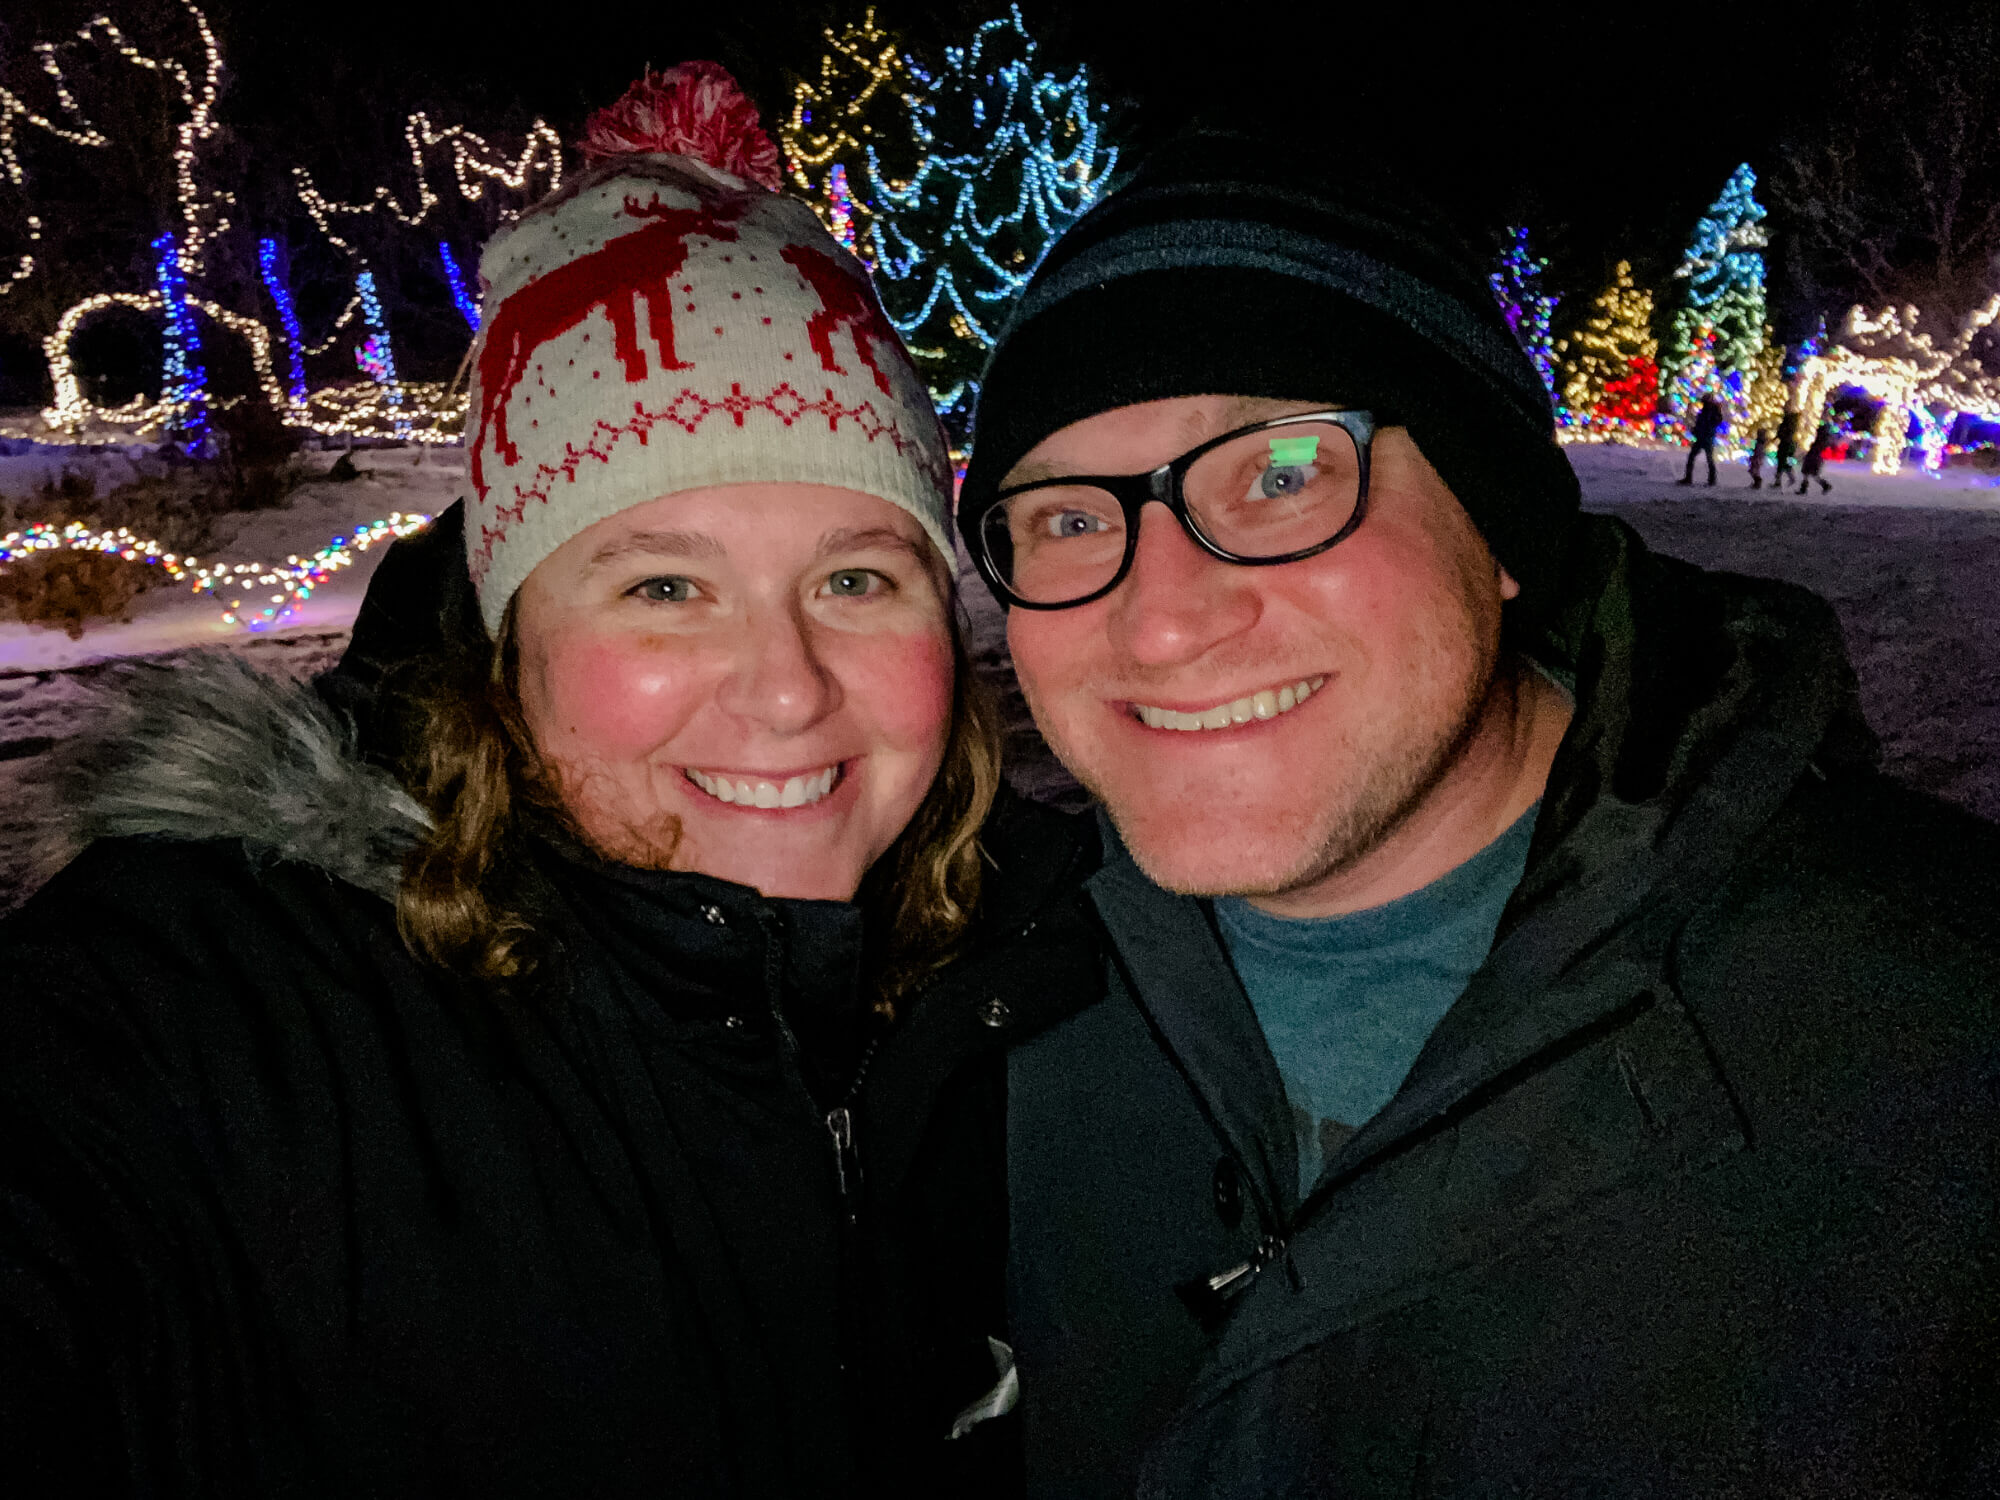 Date Night - Christmas Lights